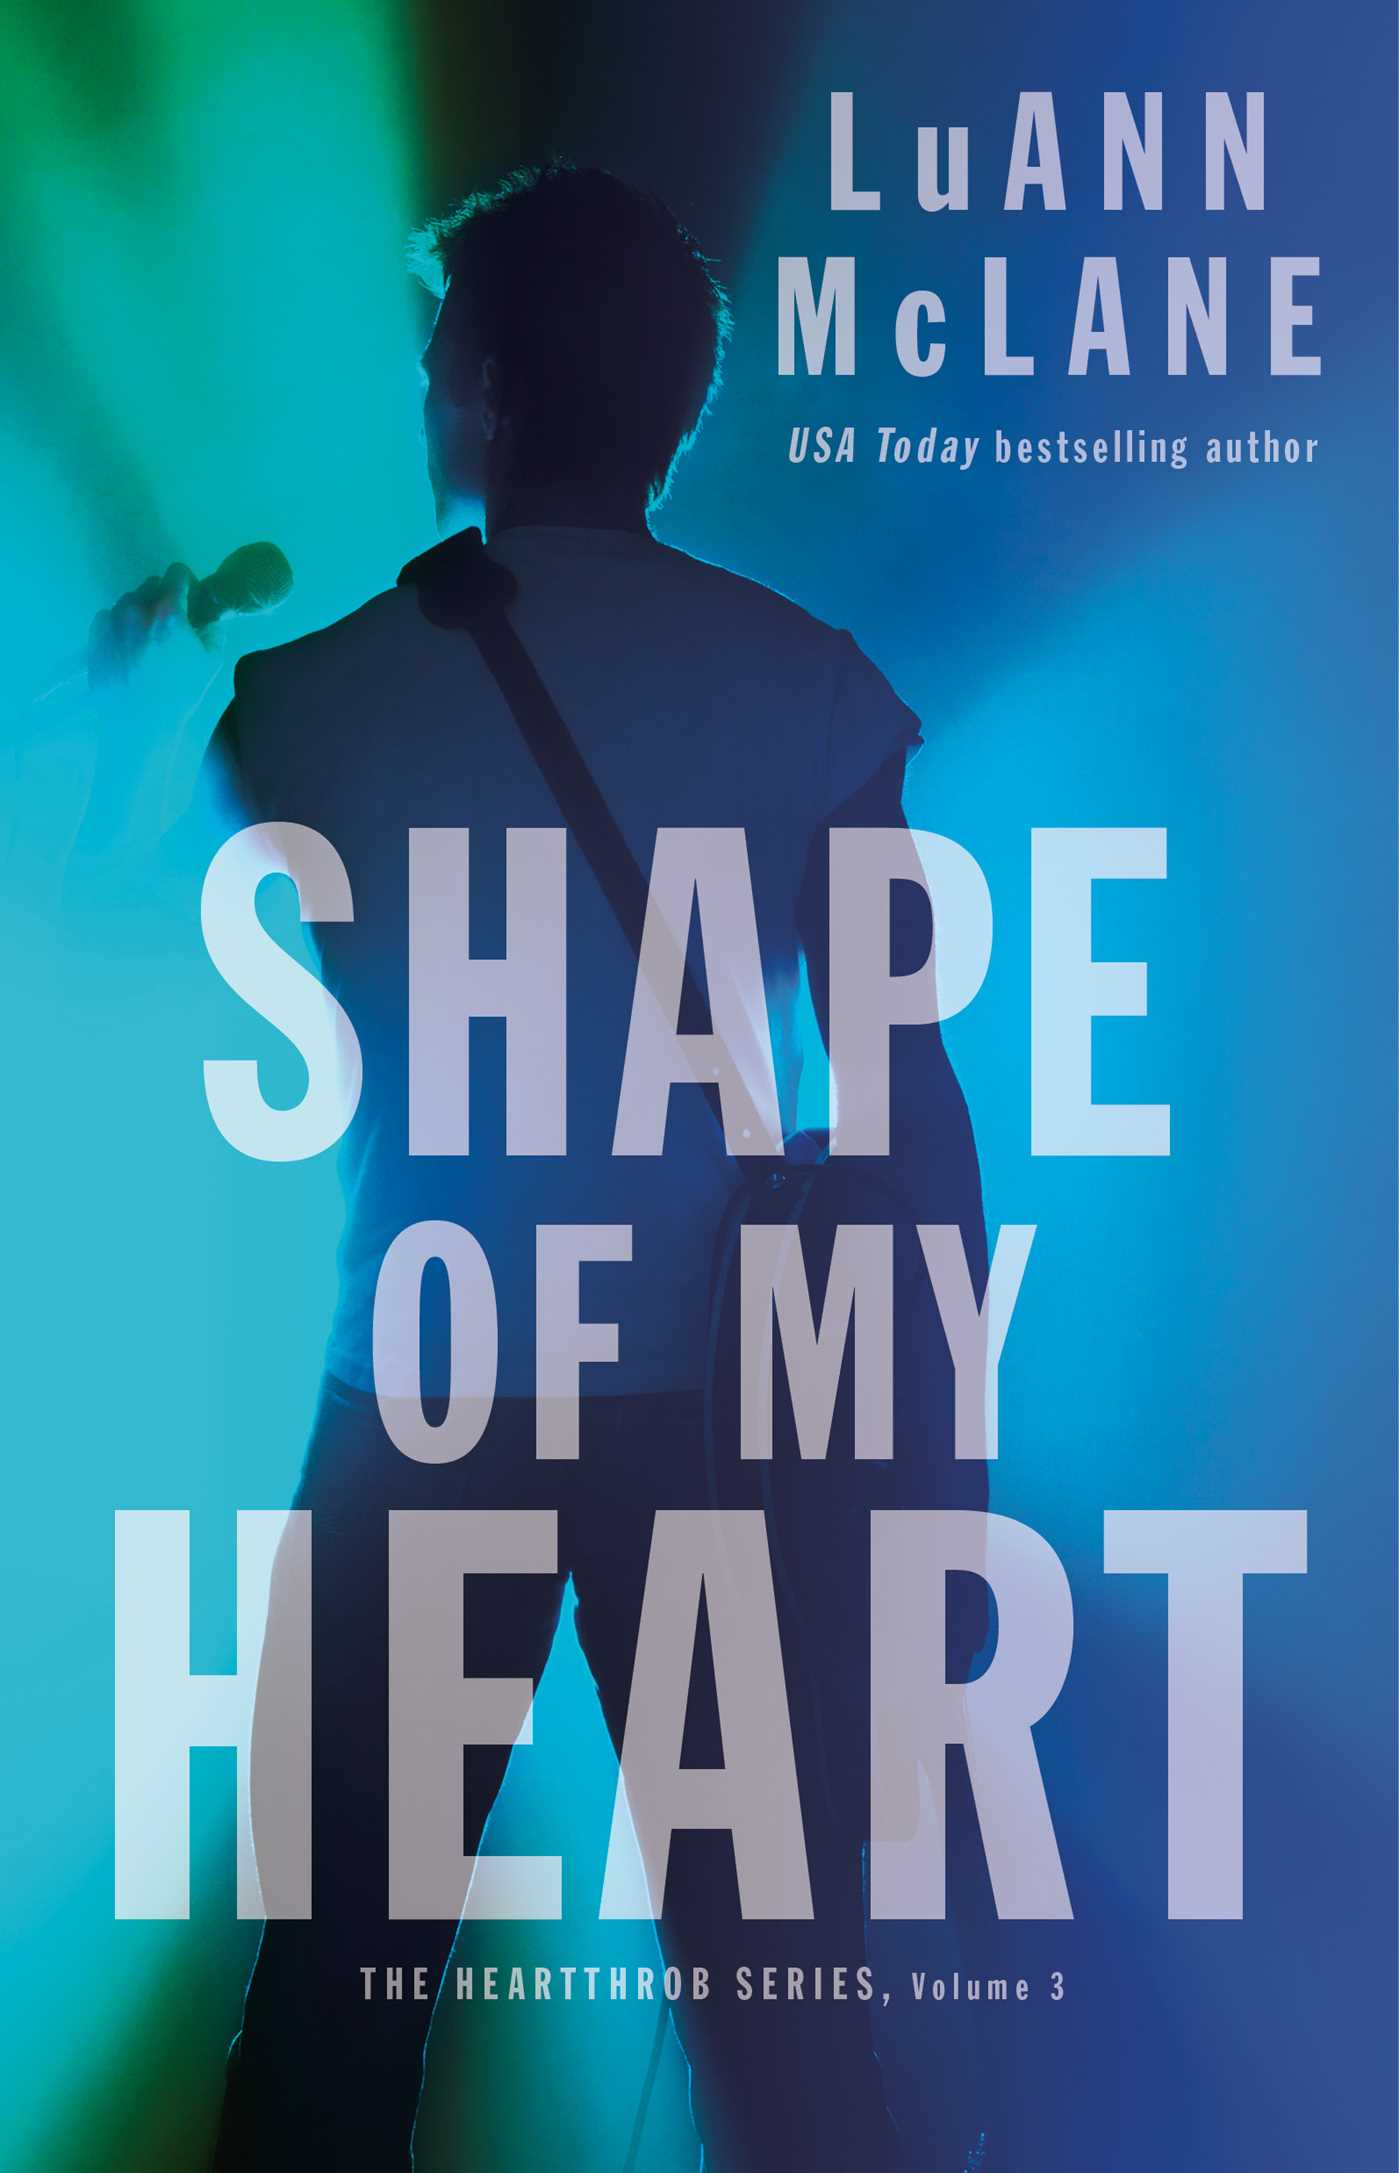 Shape of my heart 9781501172564 hr